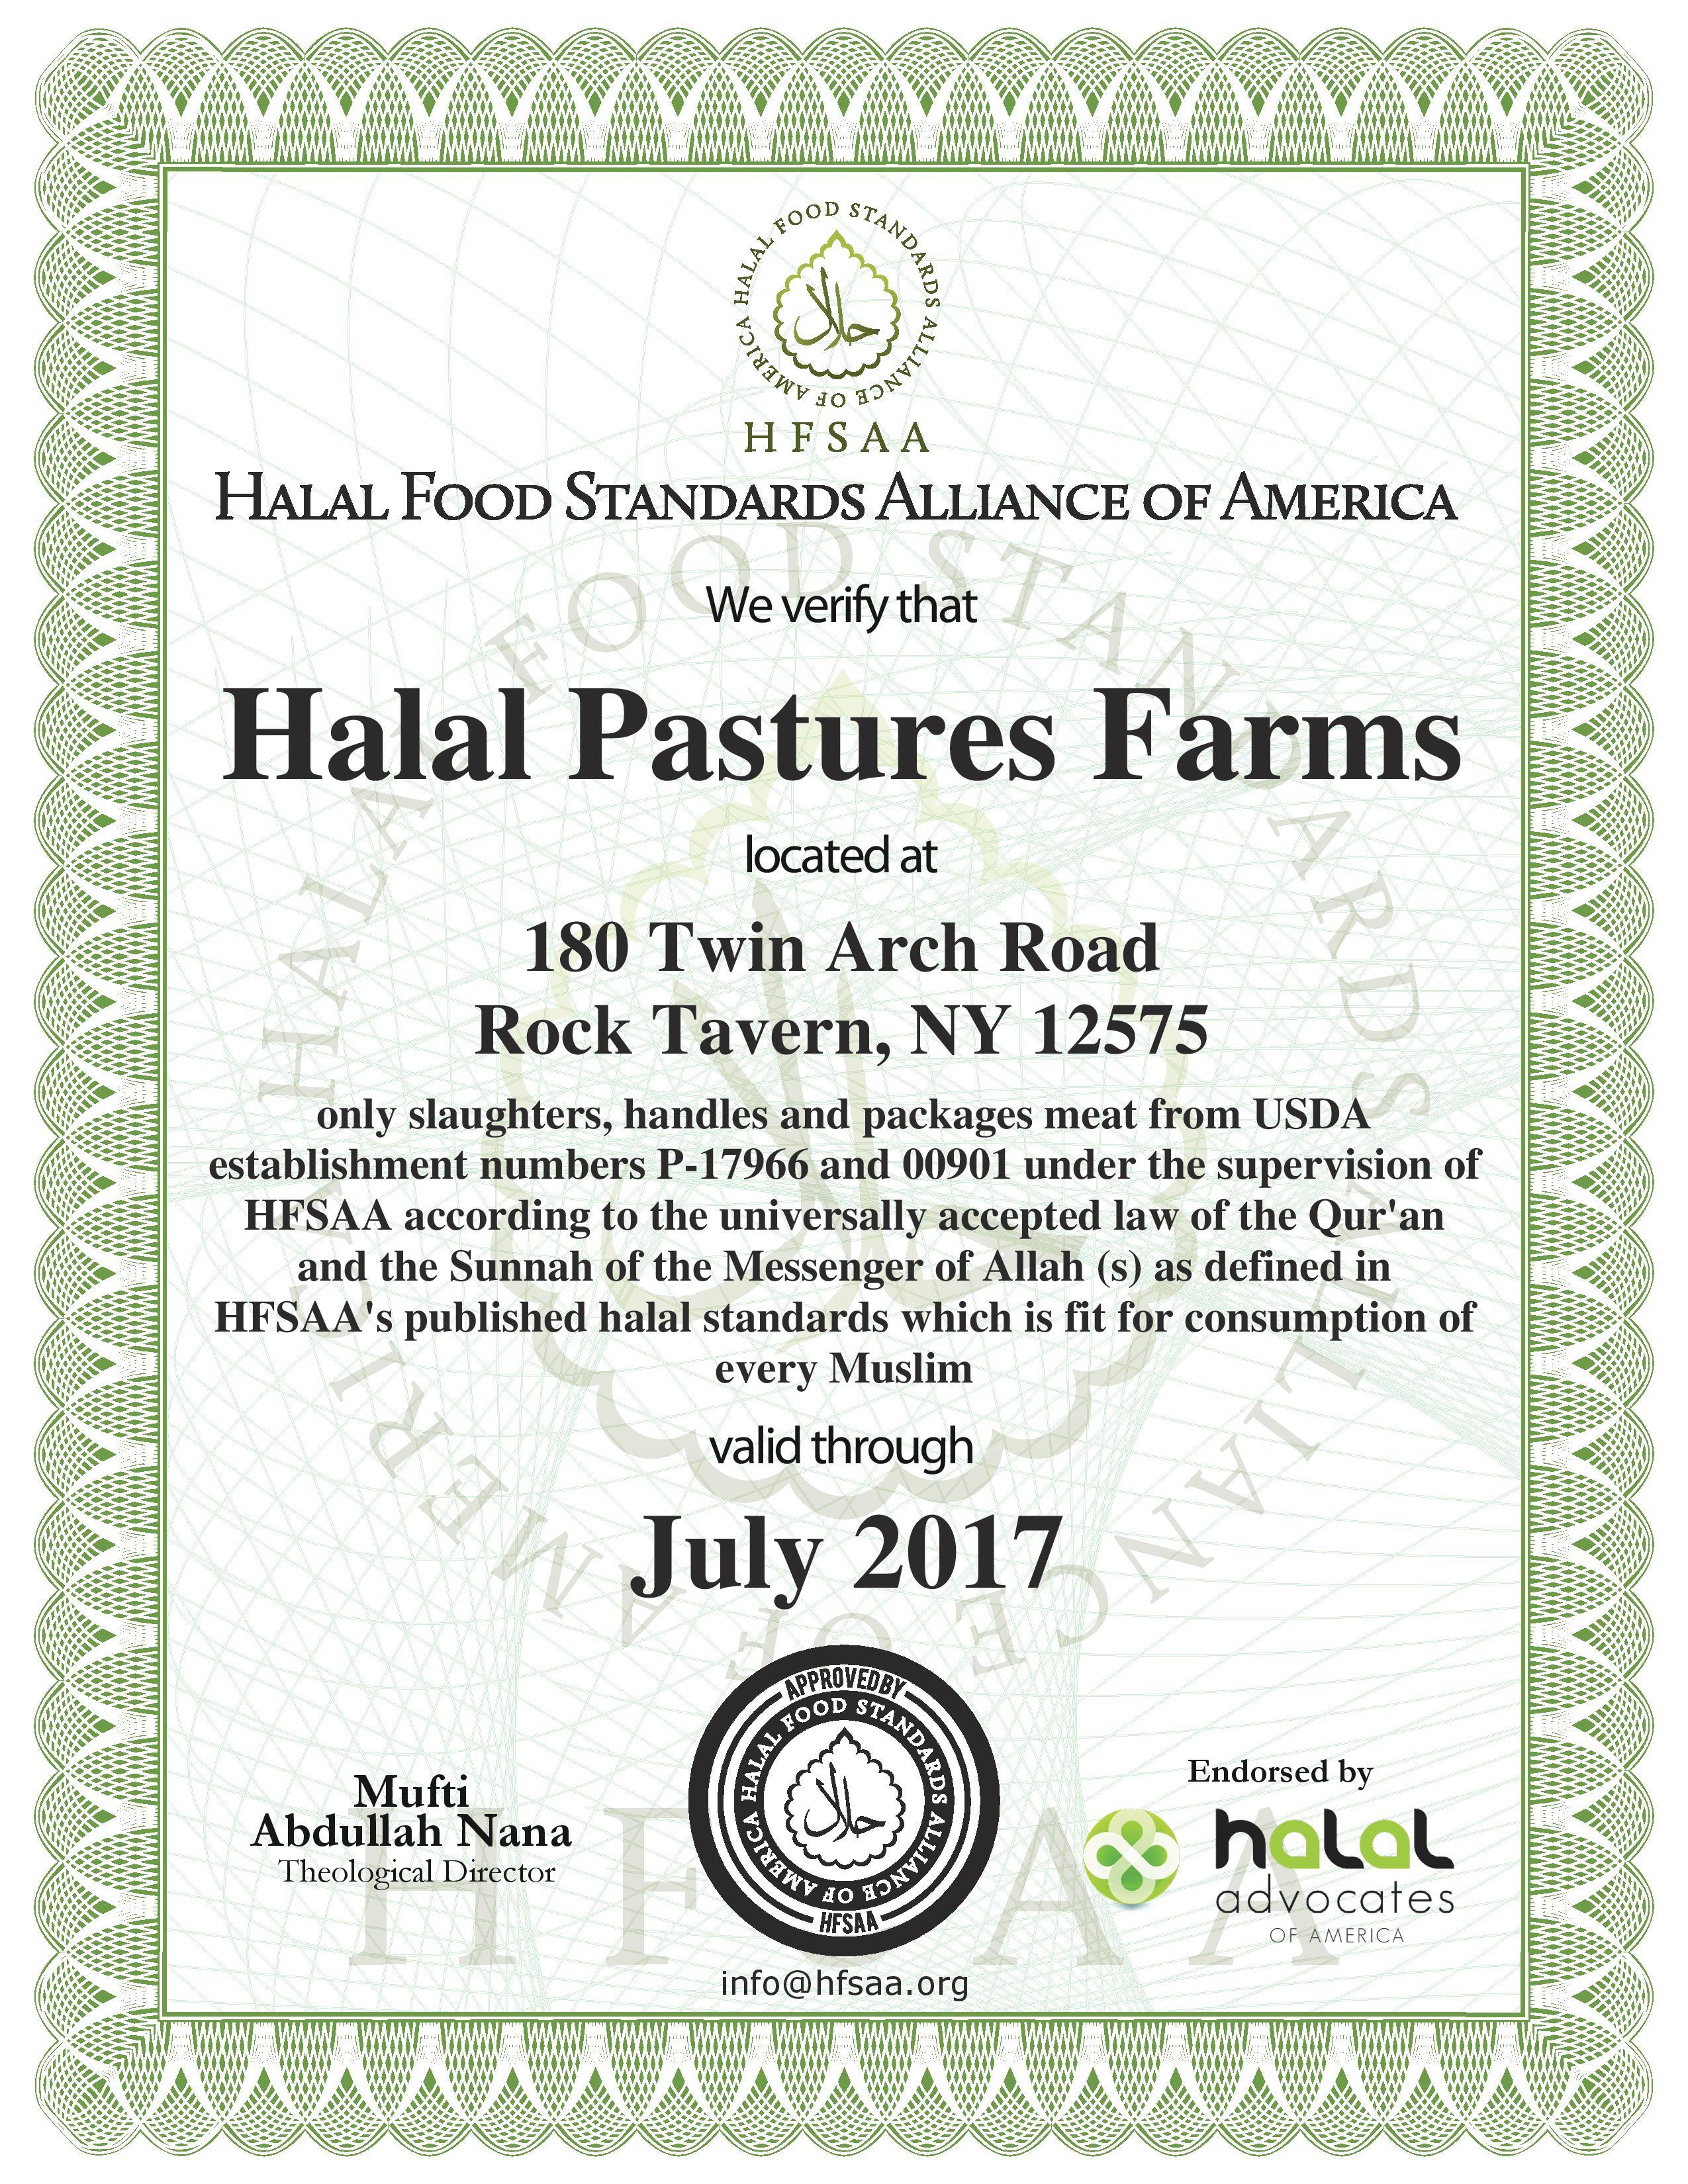 halal-pastures-2017.jpg